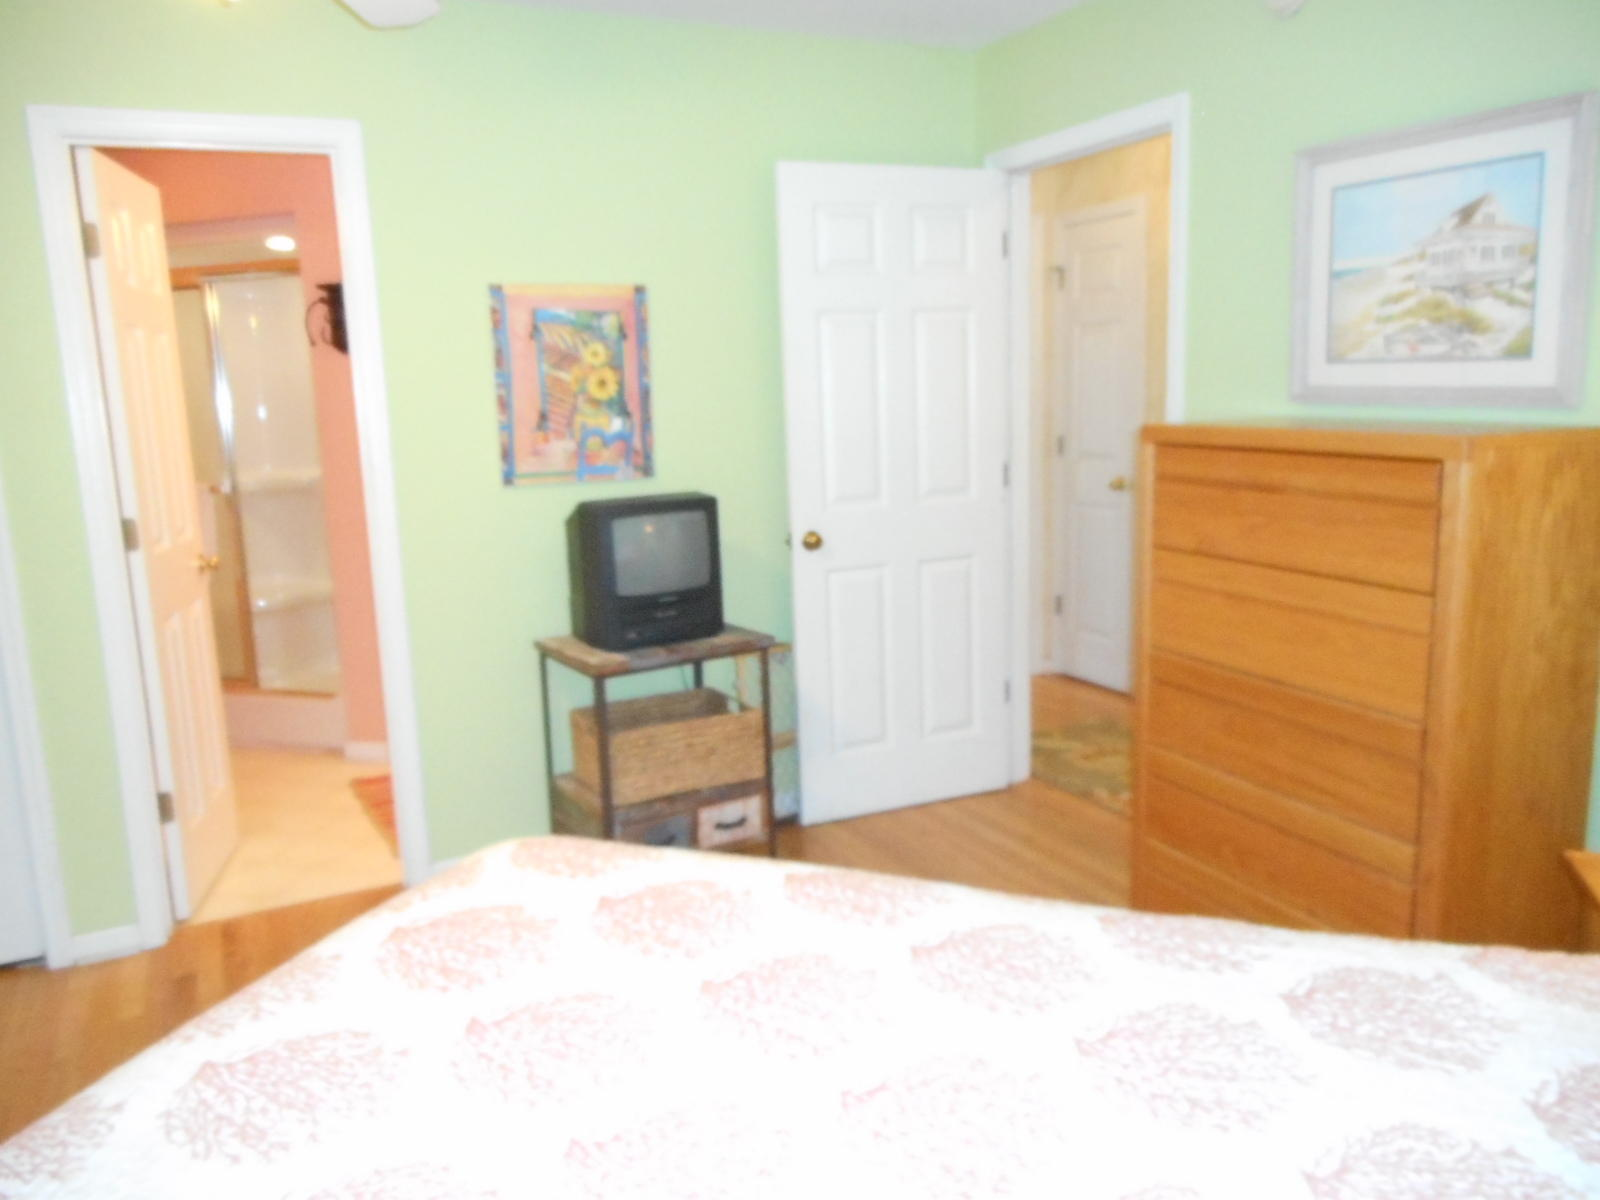 Hammocks Homes For Sale - 1106 Hammocks, Edisto Island, SC - 44